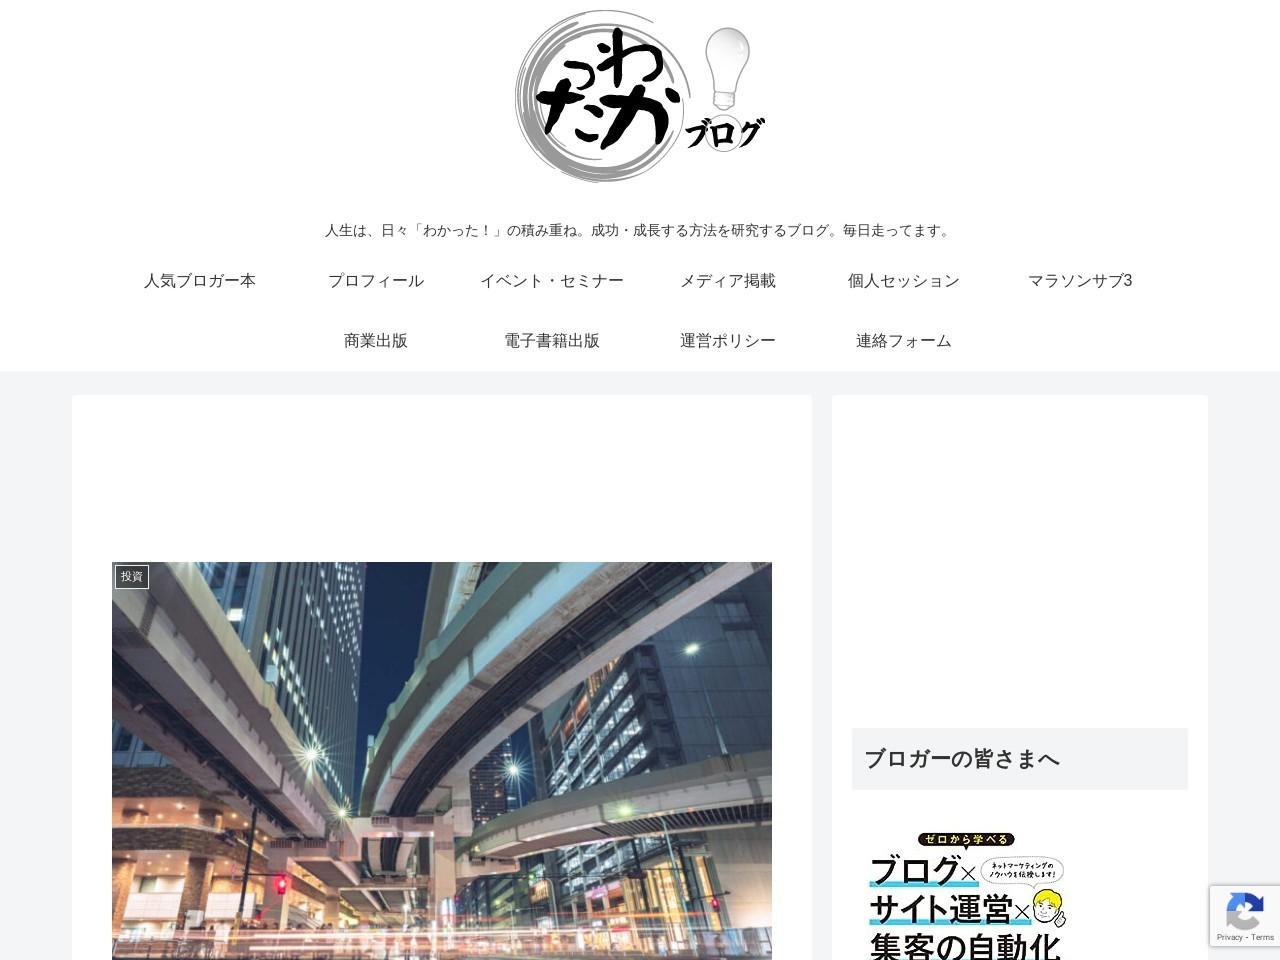 http://www.wakatta-blog.com/wp-ogp-myself.html